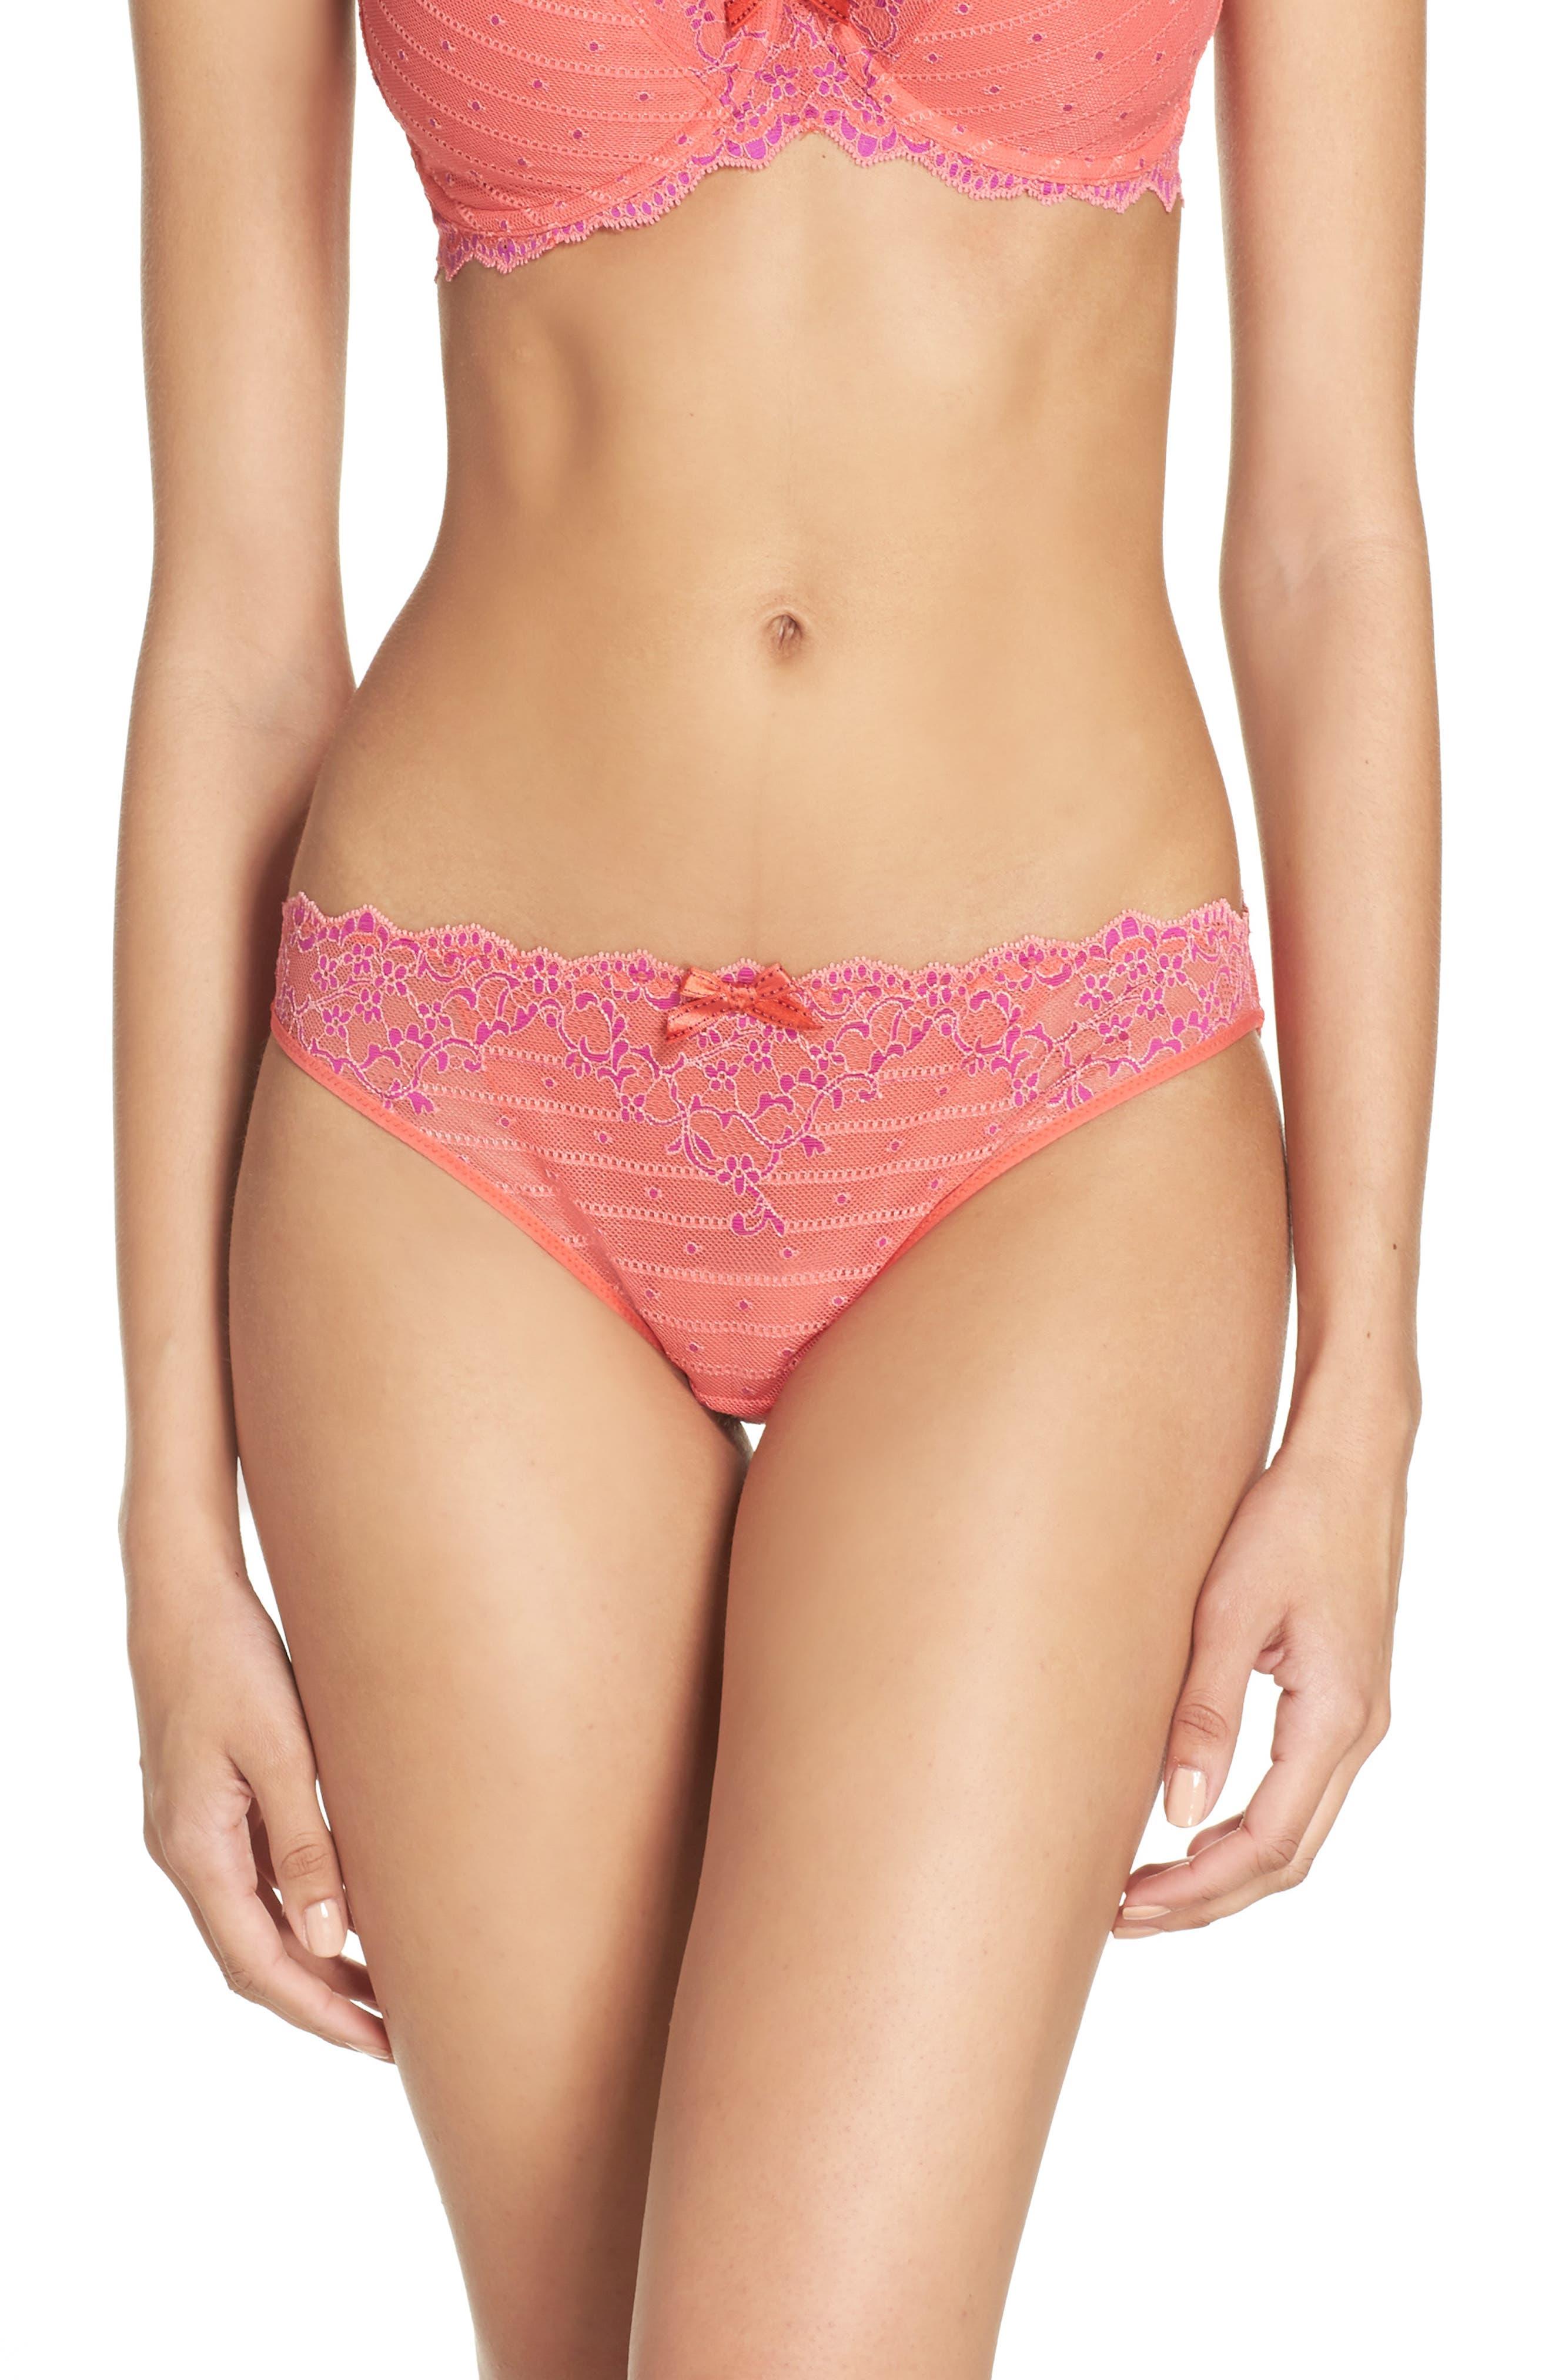 Main Image - Chantelle Intimates 'Rive Gauche' Bikini